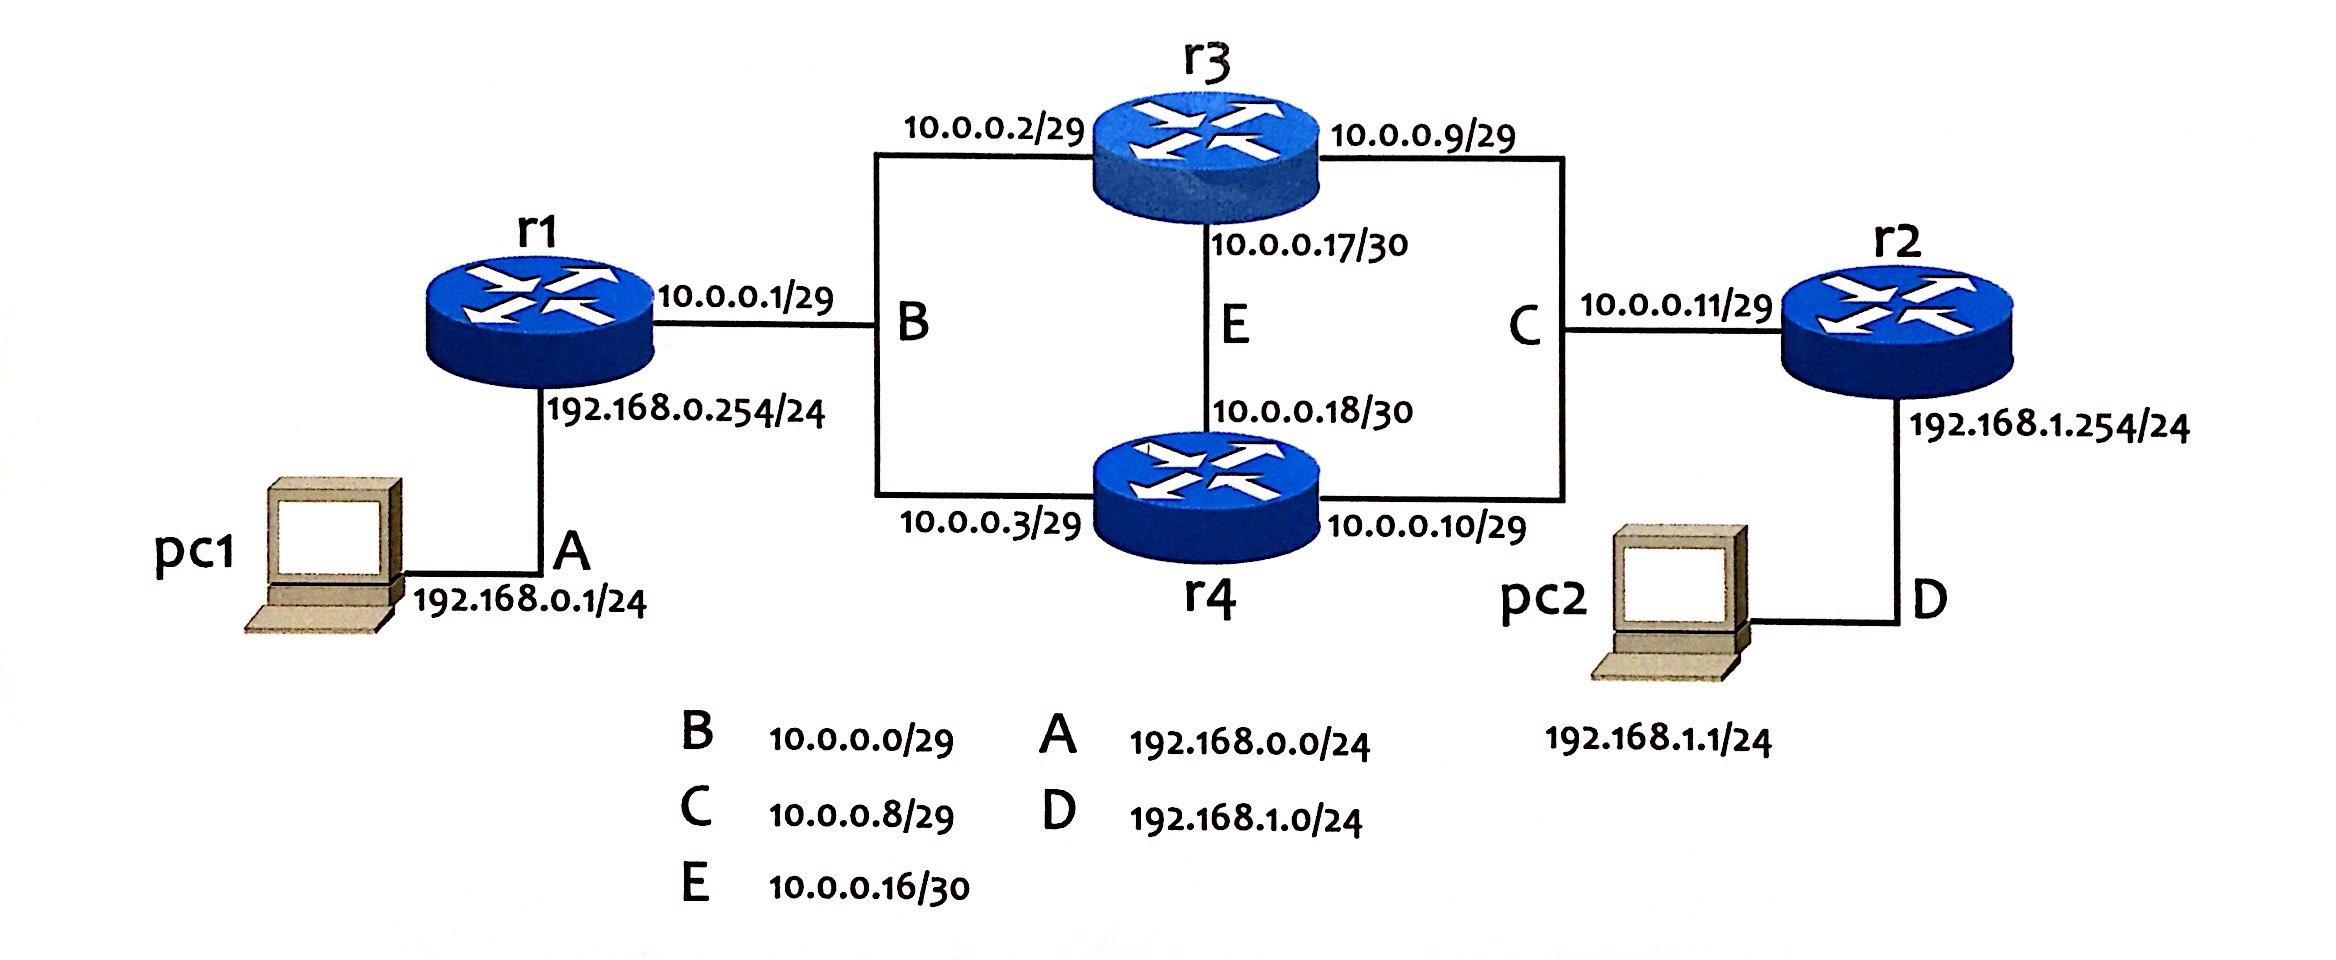 lab3.jpg-232kB